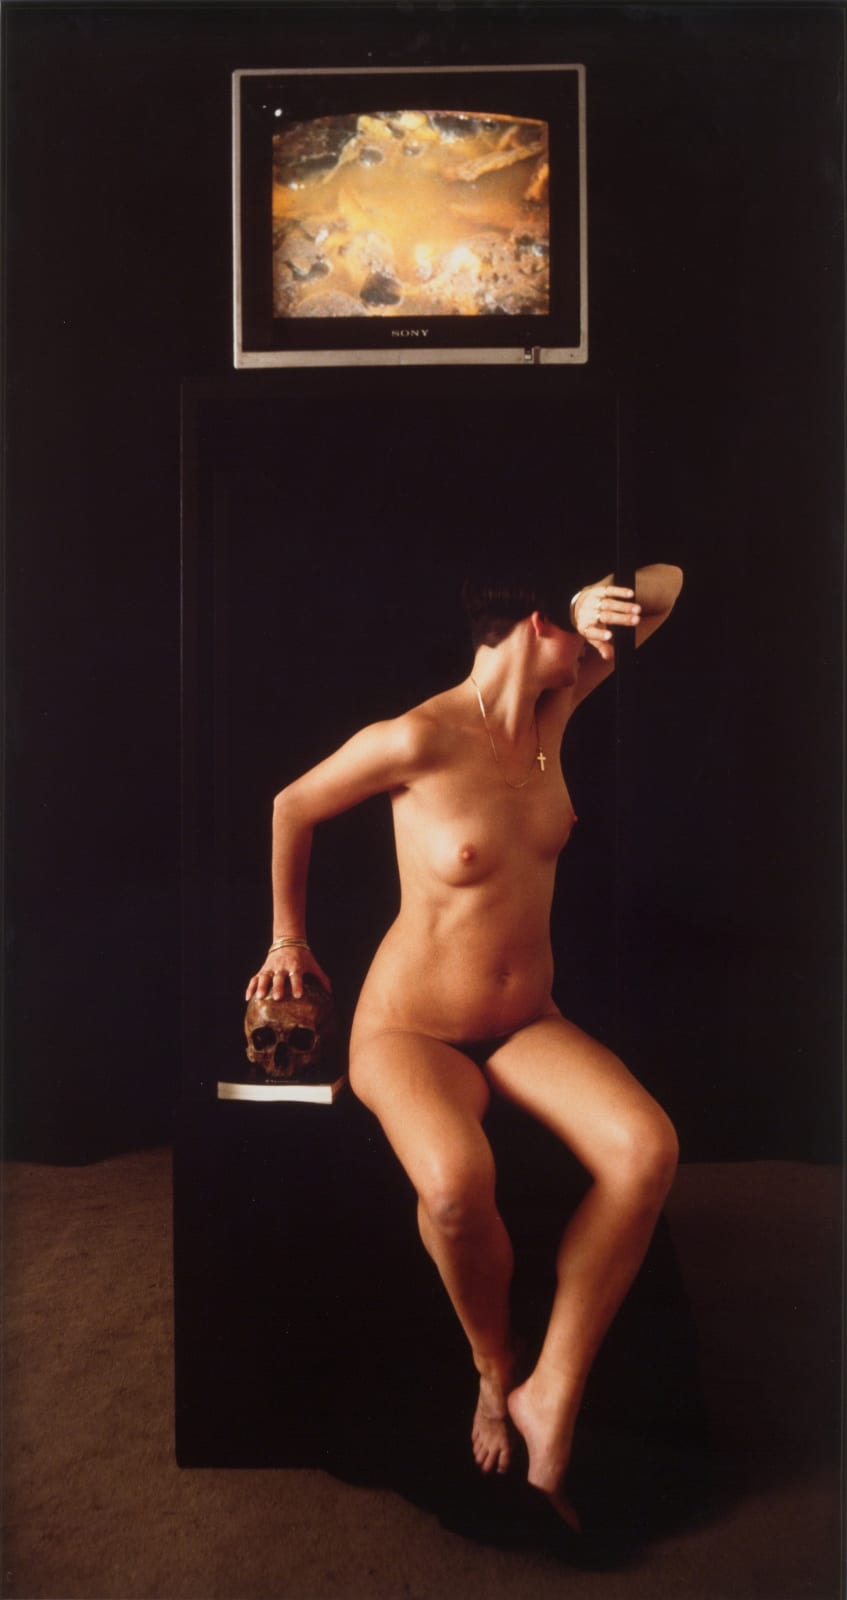 Helen CHADWICK Ruin, 1986 Cibachrome photograph 91.5 x 46 cm